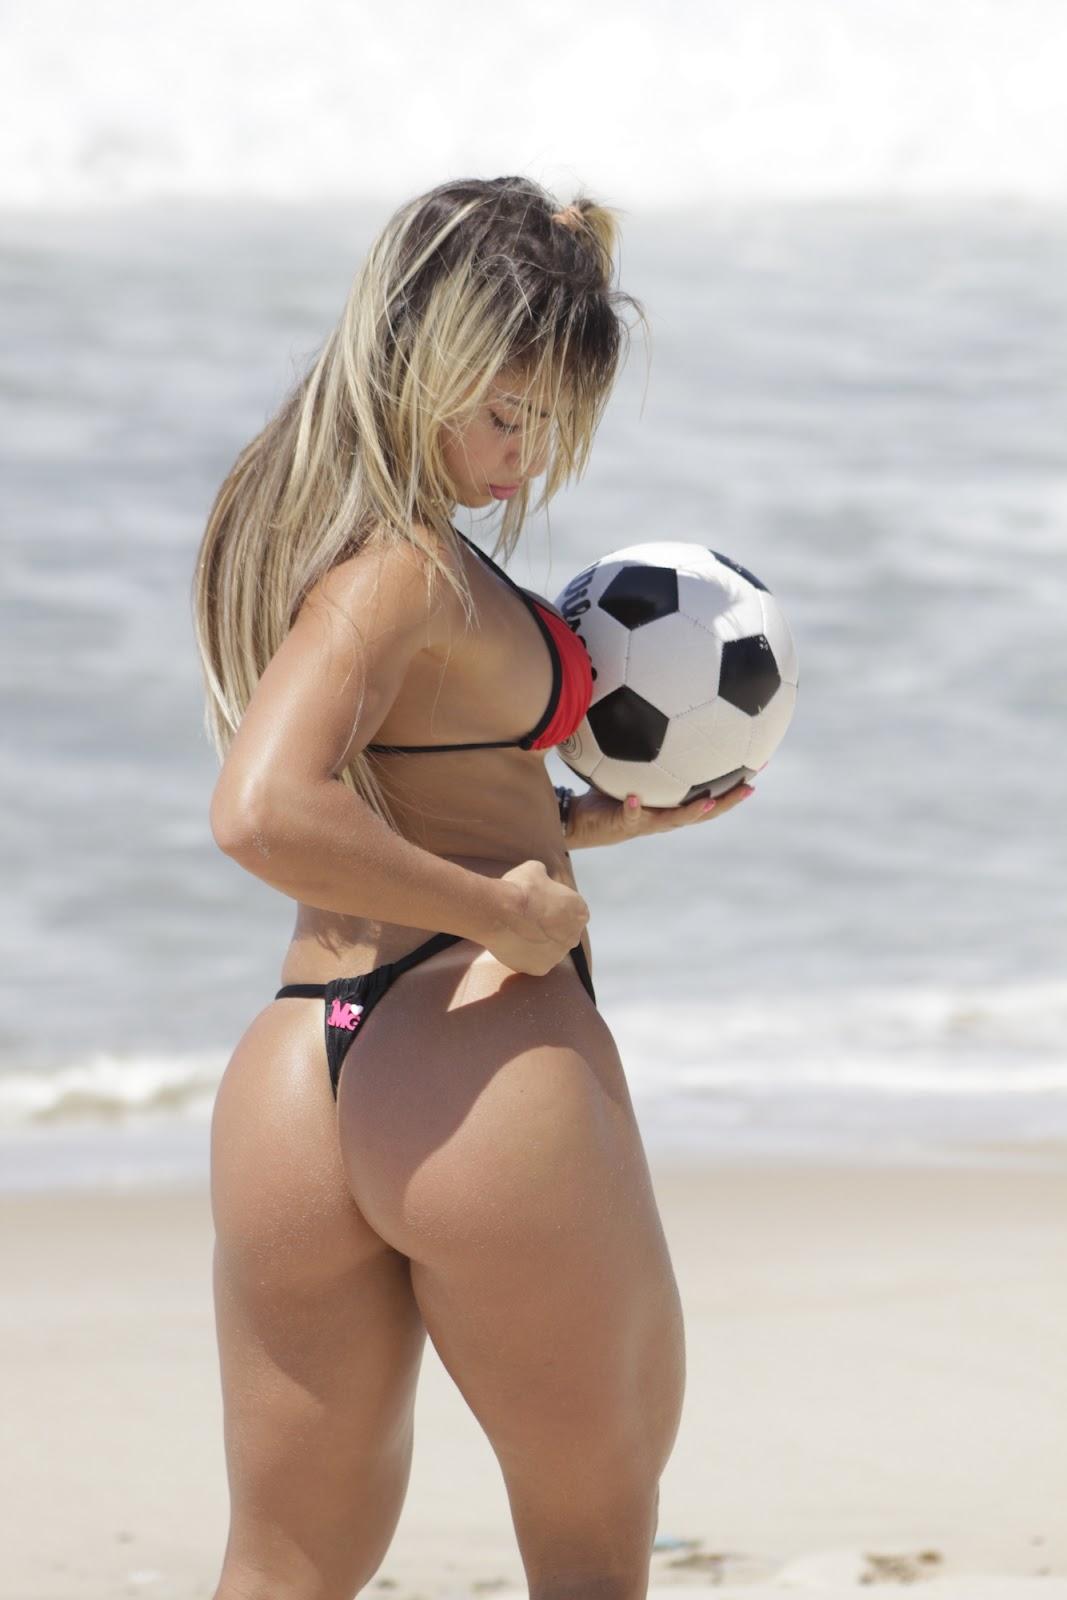 http://4.bp.blogspot.com/-pDWEy05kwQI/UGPJw-W2AZI/AAAAAAAADpQ/7la0jjBdj28/s1600/Priscila-Freitas-musa-do-Flamengo-+(3).JPG